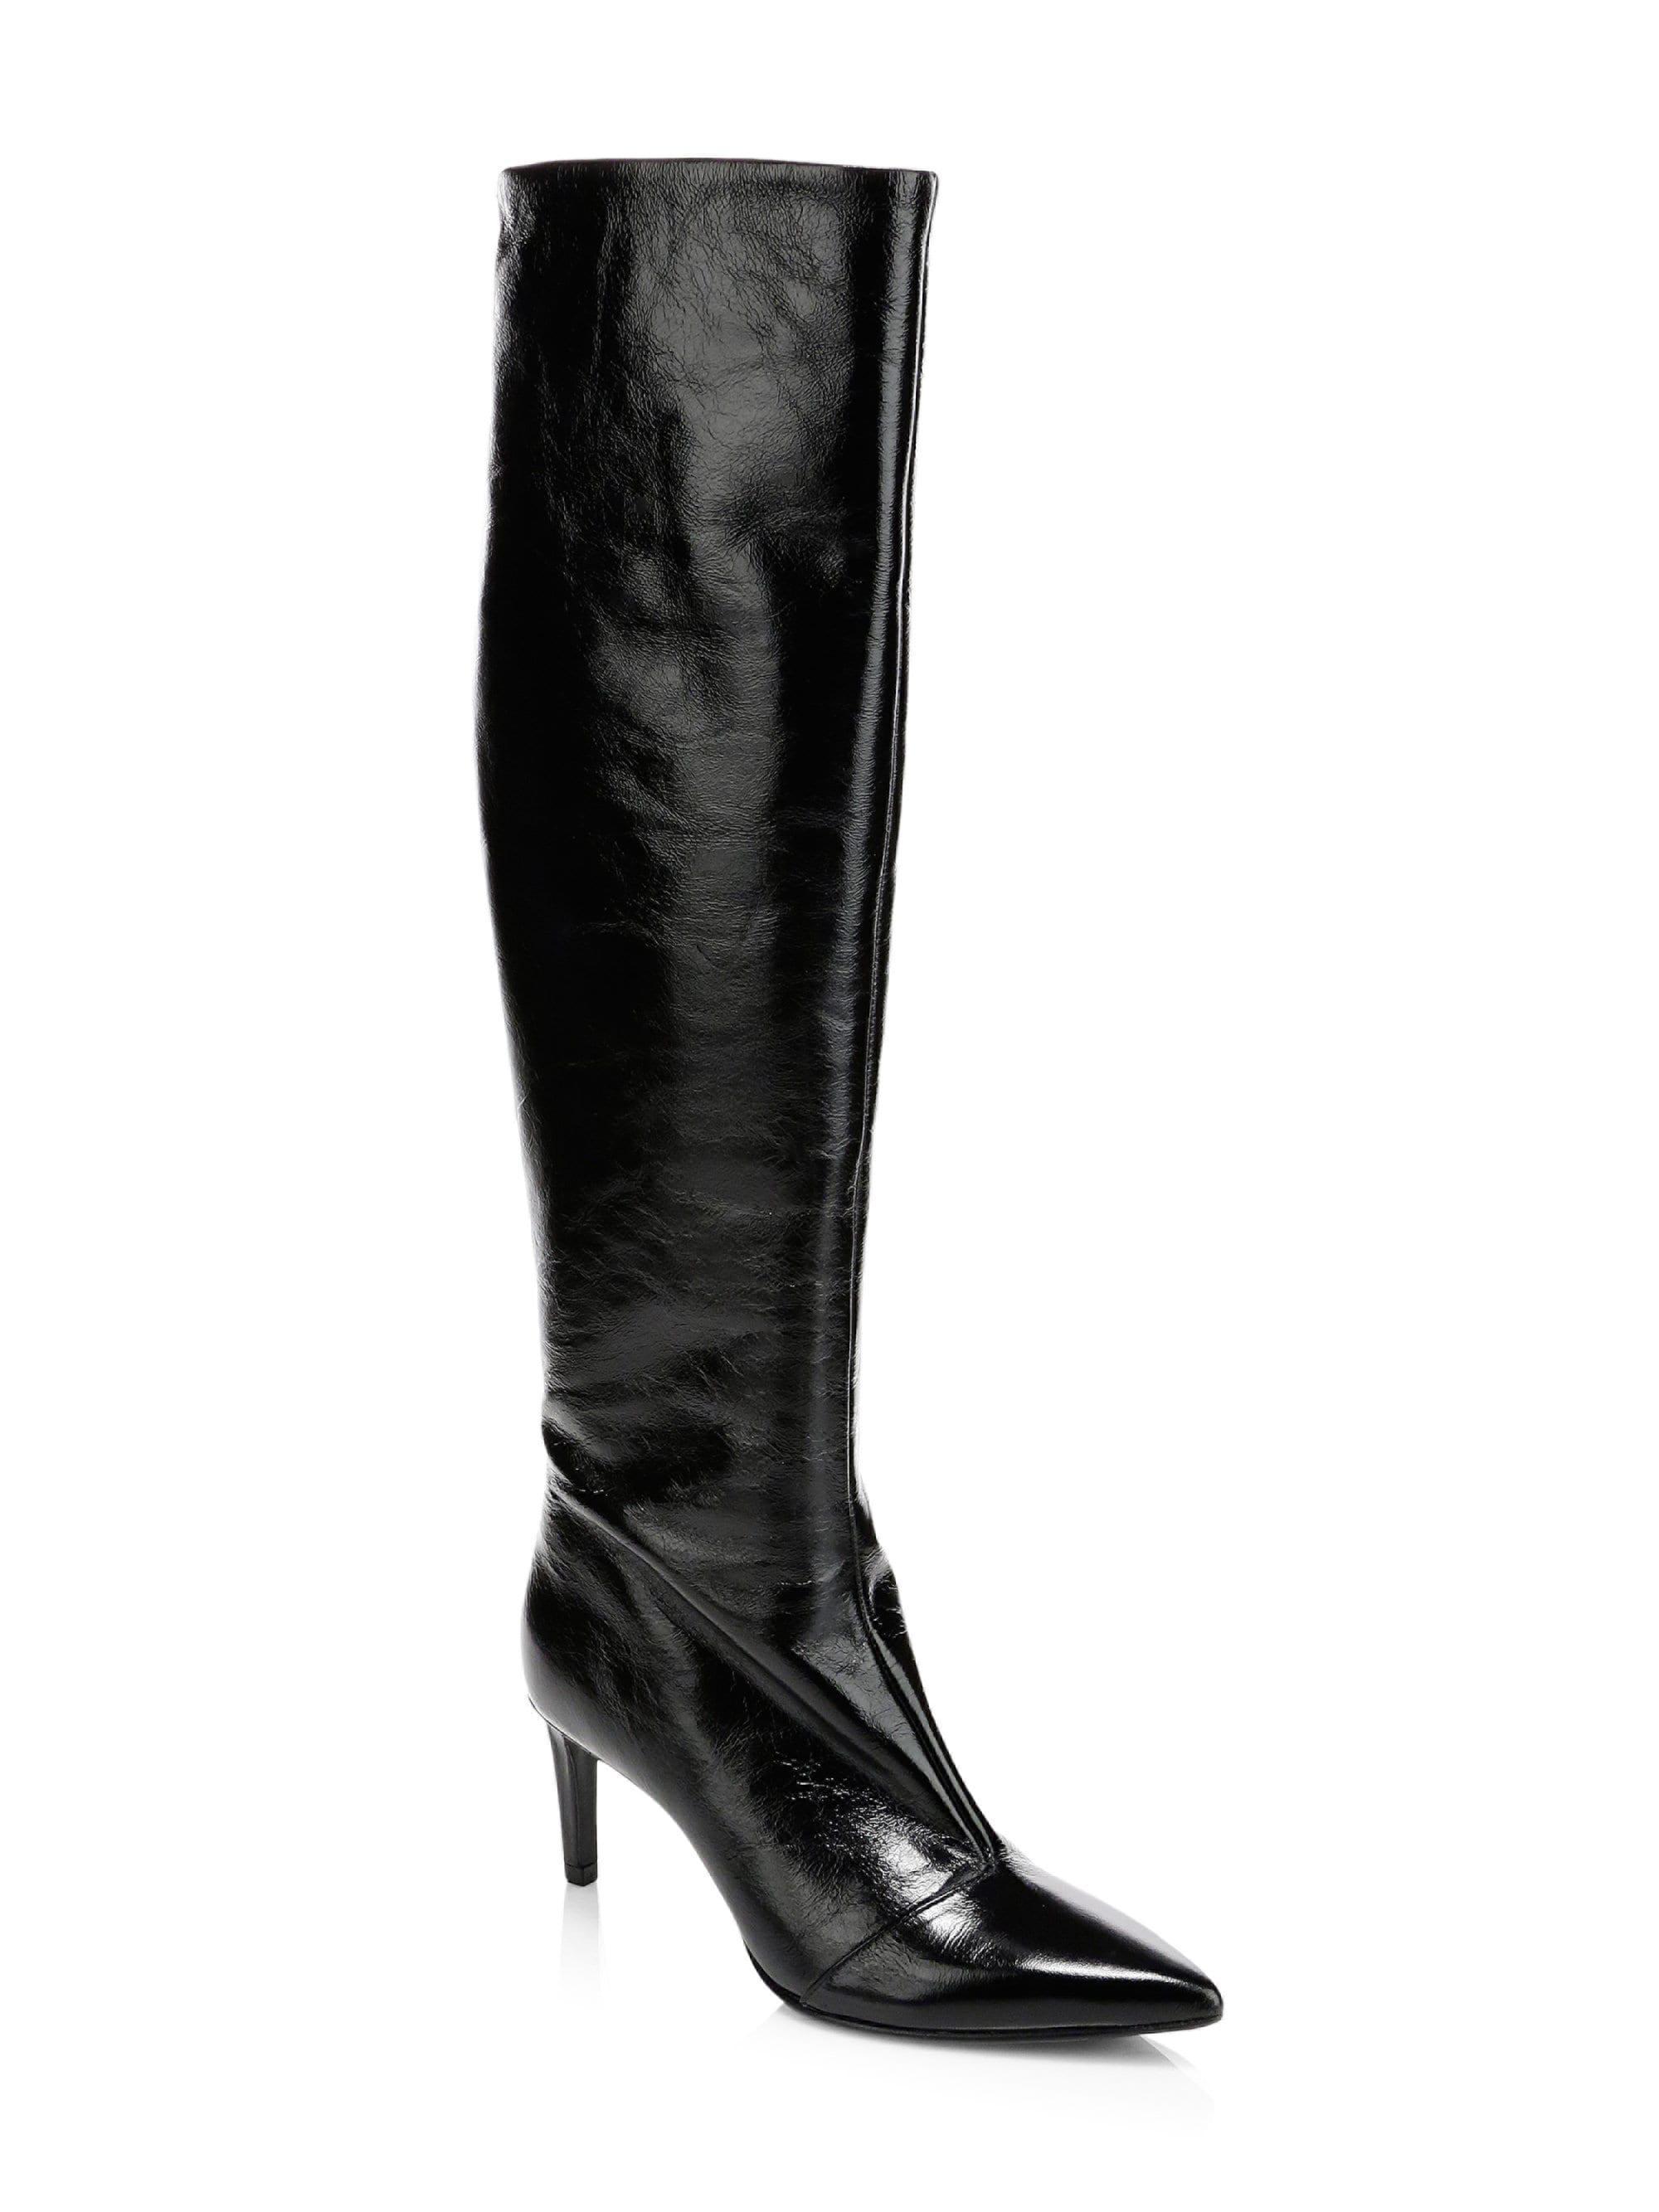 b5527b3a58d7 Lyst - Rag   Bone Beha Knee-high Leather Boots in Black